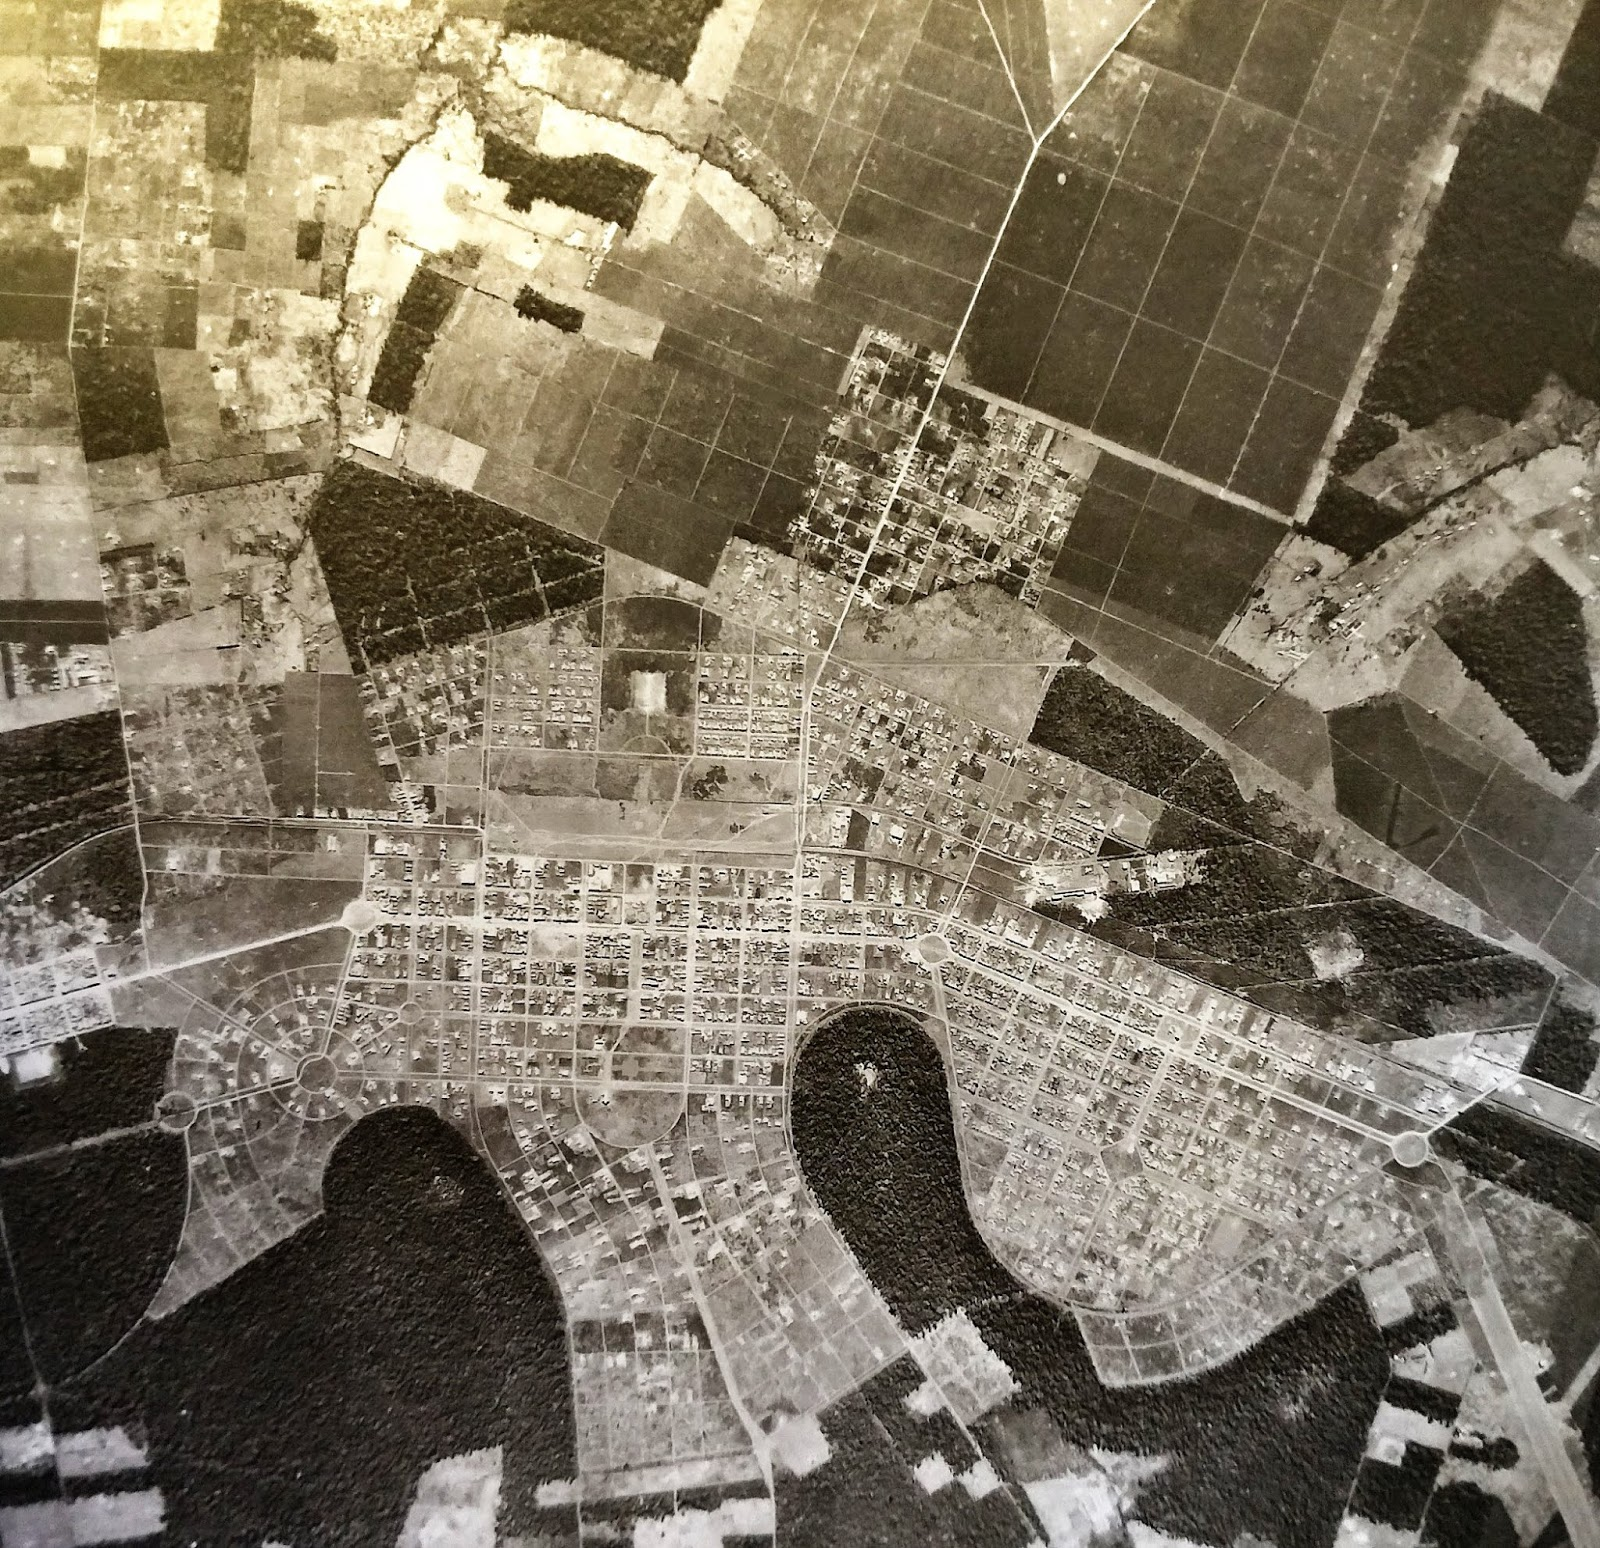 Levantamento aerofotogramétrico - Década de 1950